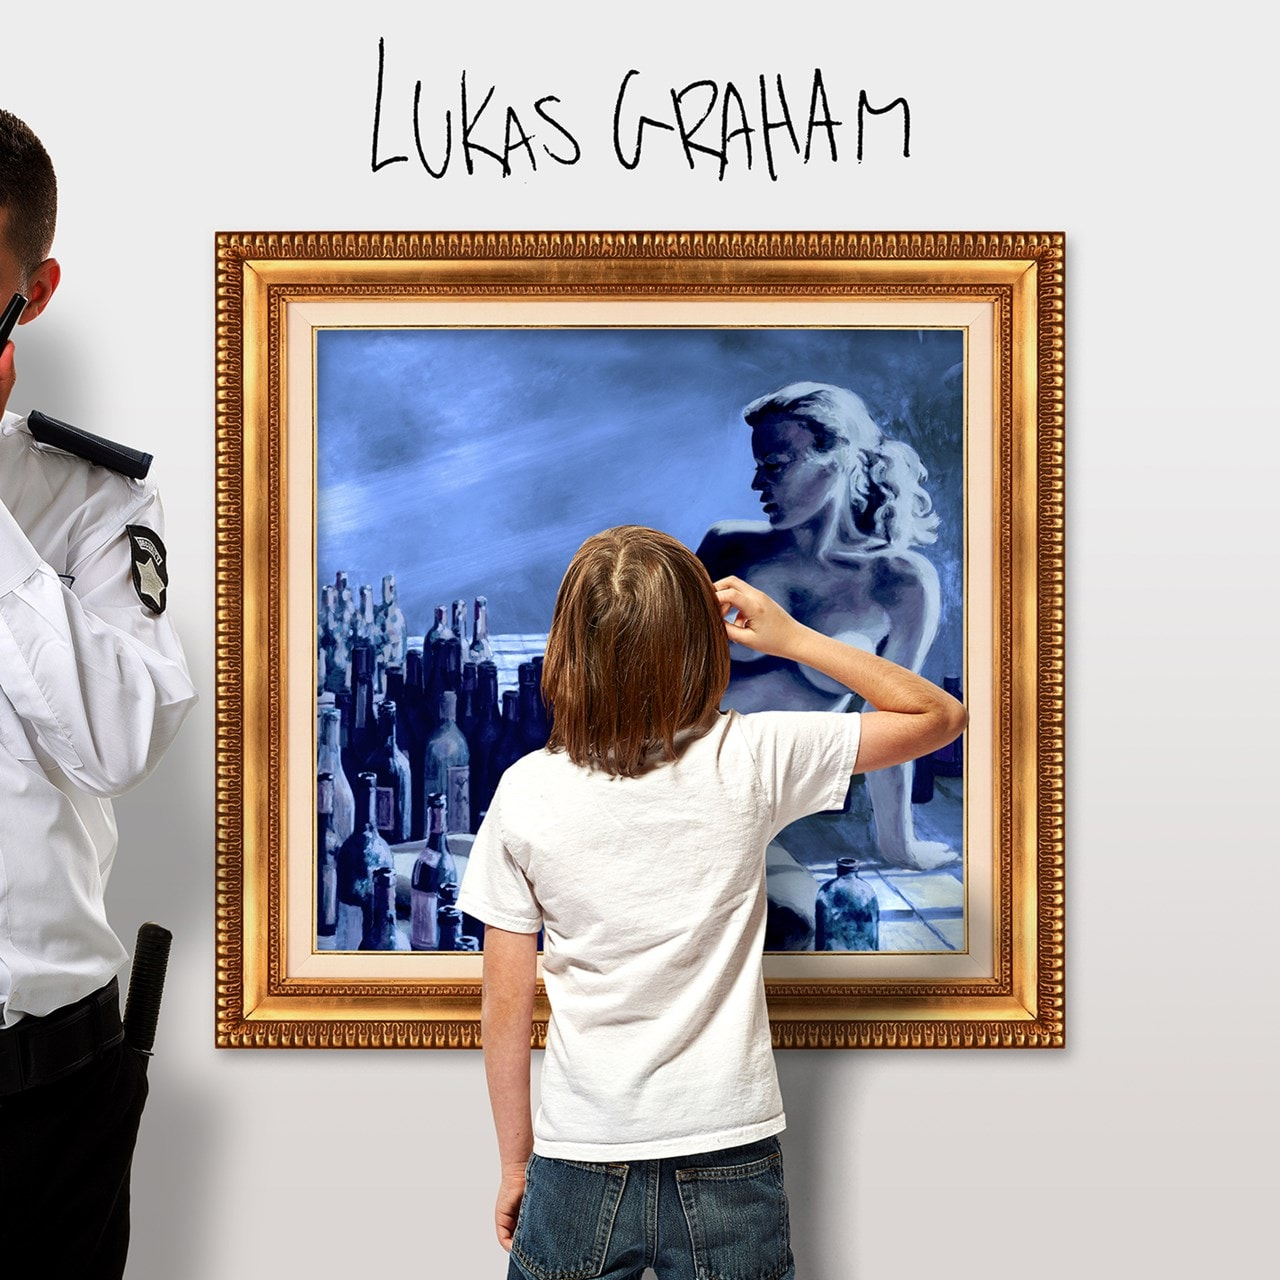 Lukas Graham - 1